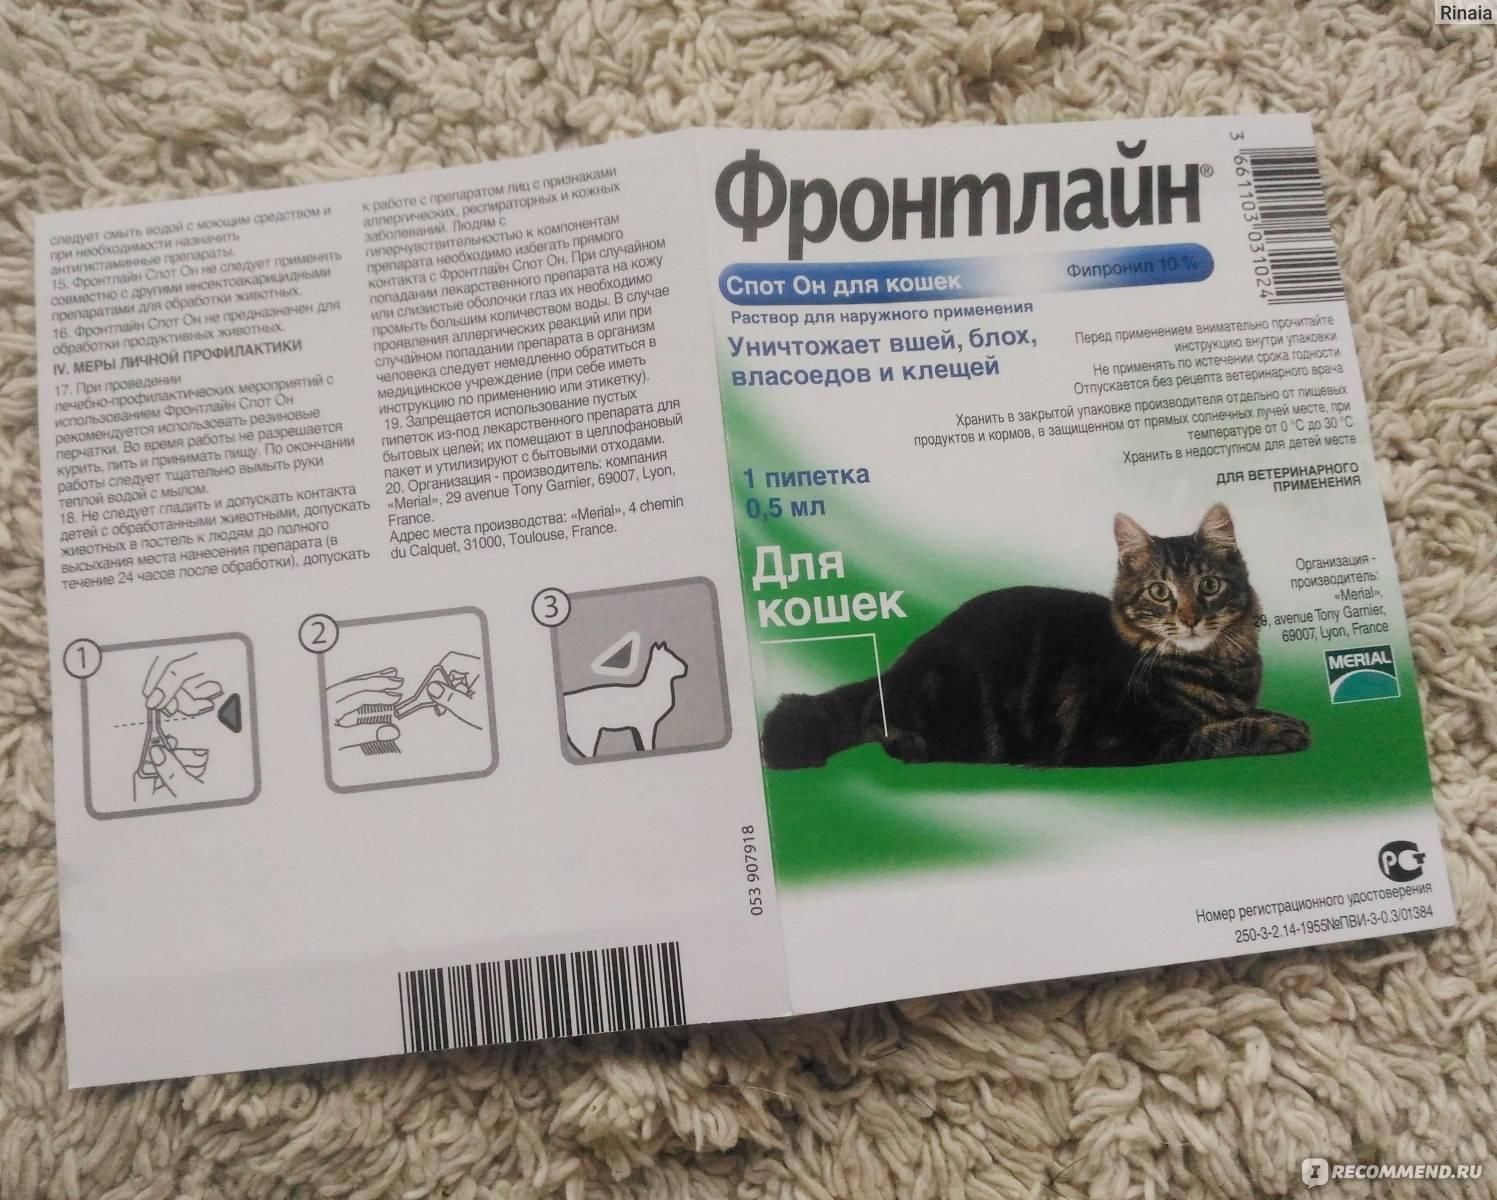 Бродлайн спот-он капли на холку для кошек